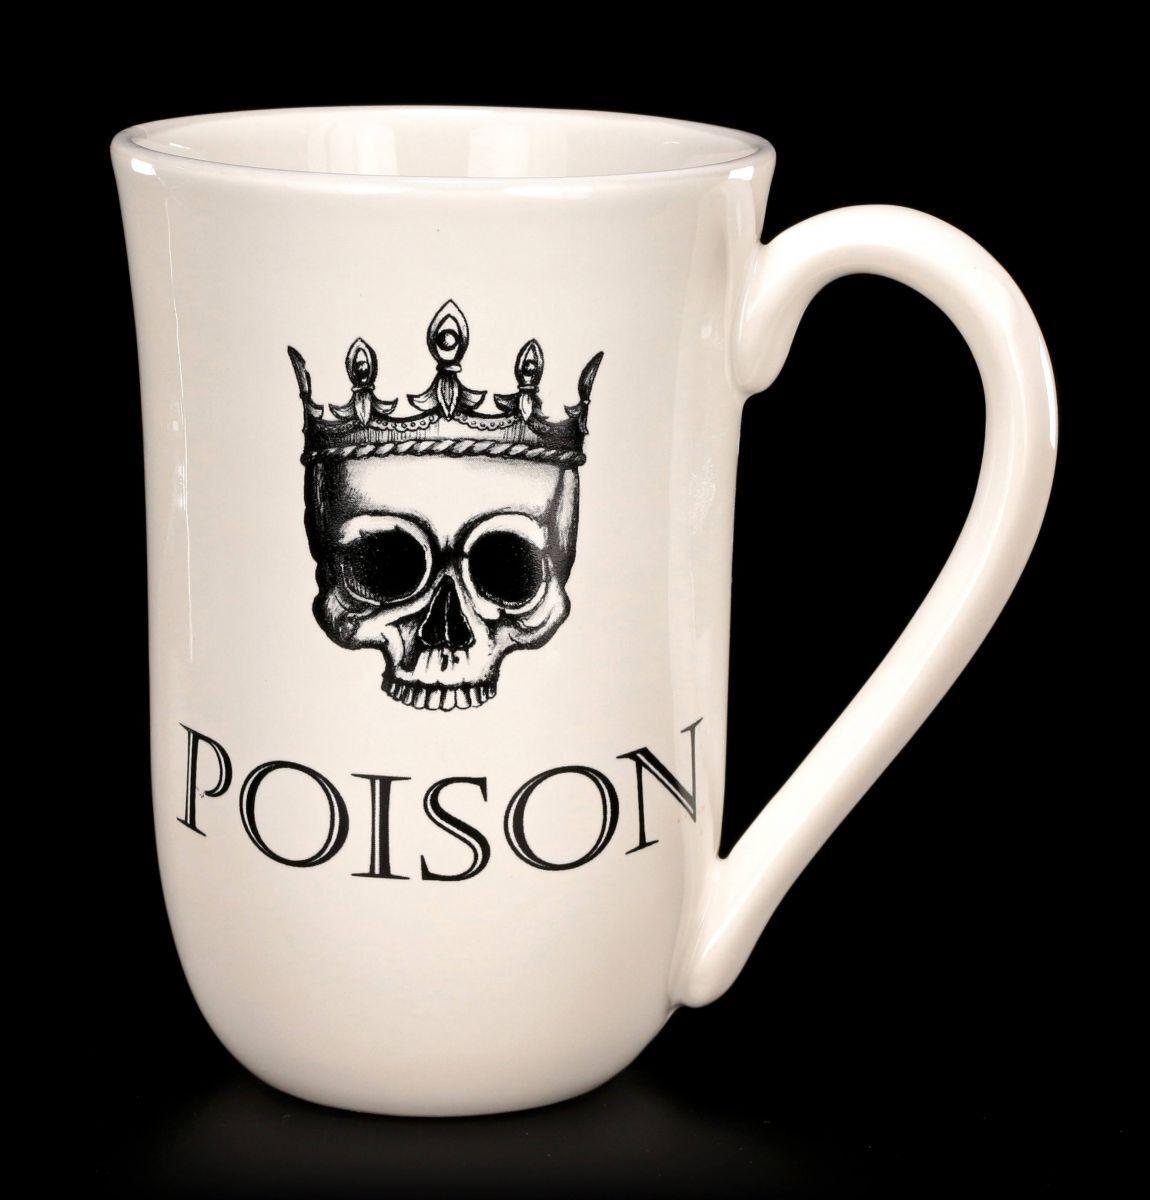 Große Keramik Tasse 600ml - Poison - Fantasy Teetasse Kaffebecher Gothic